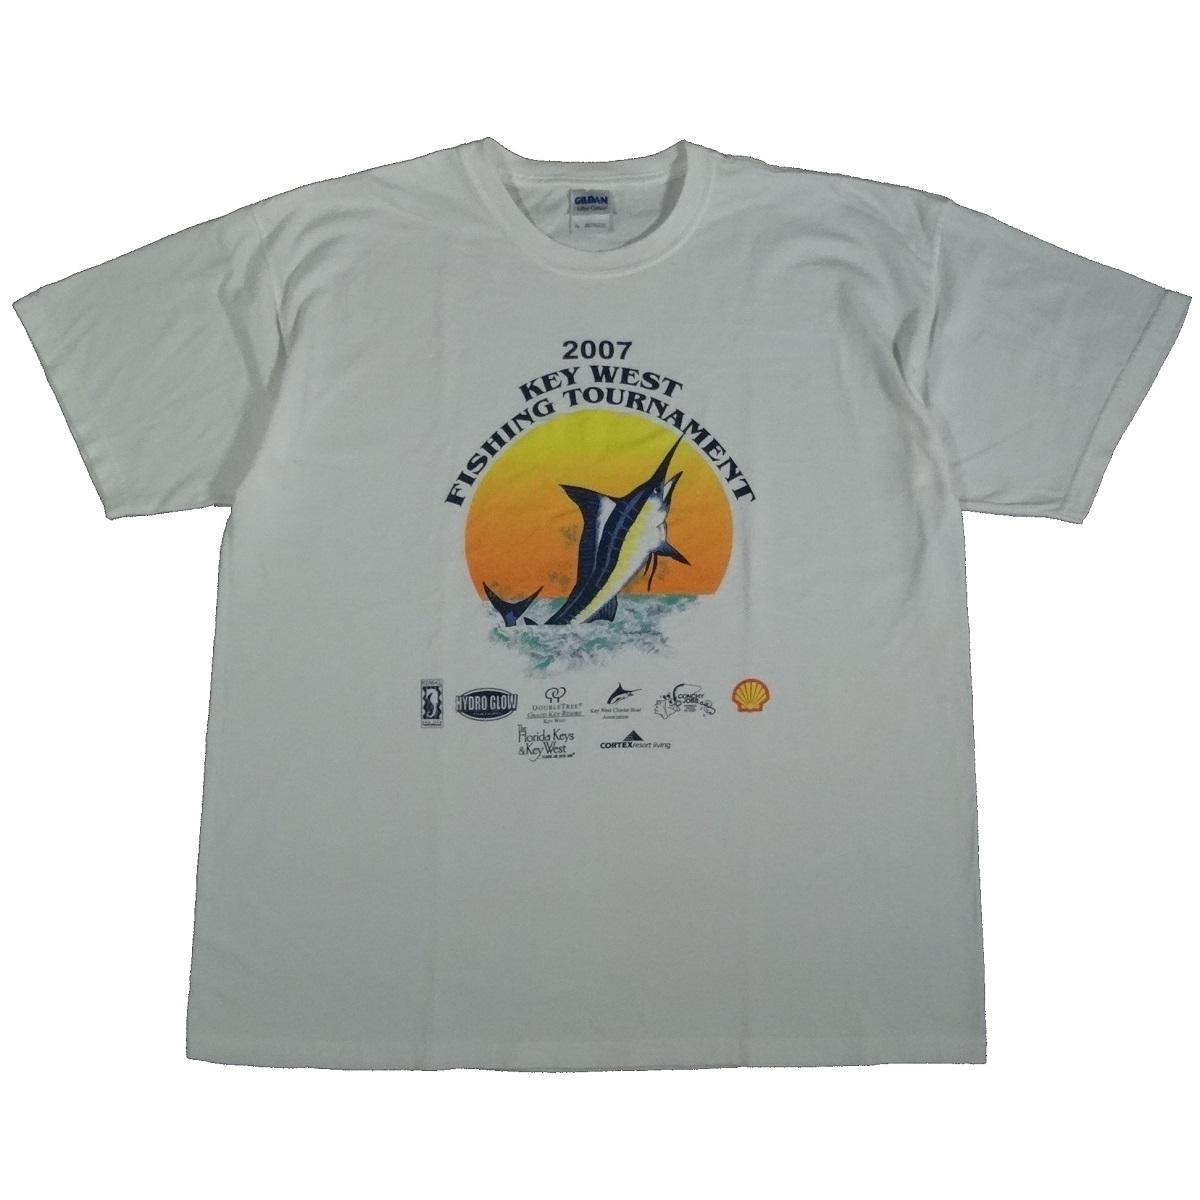 key west fishing tournament 2007 t shirt front